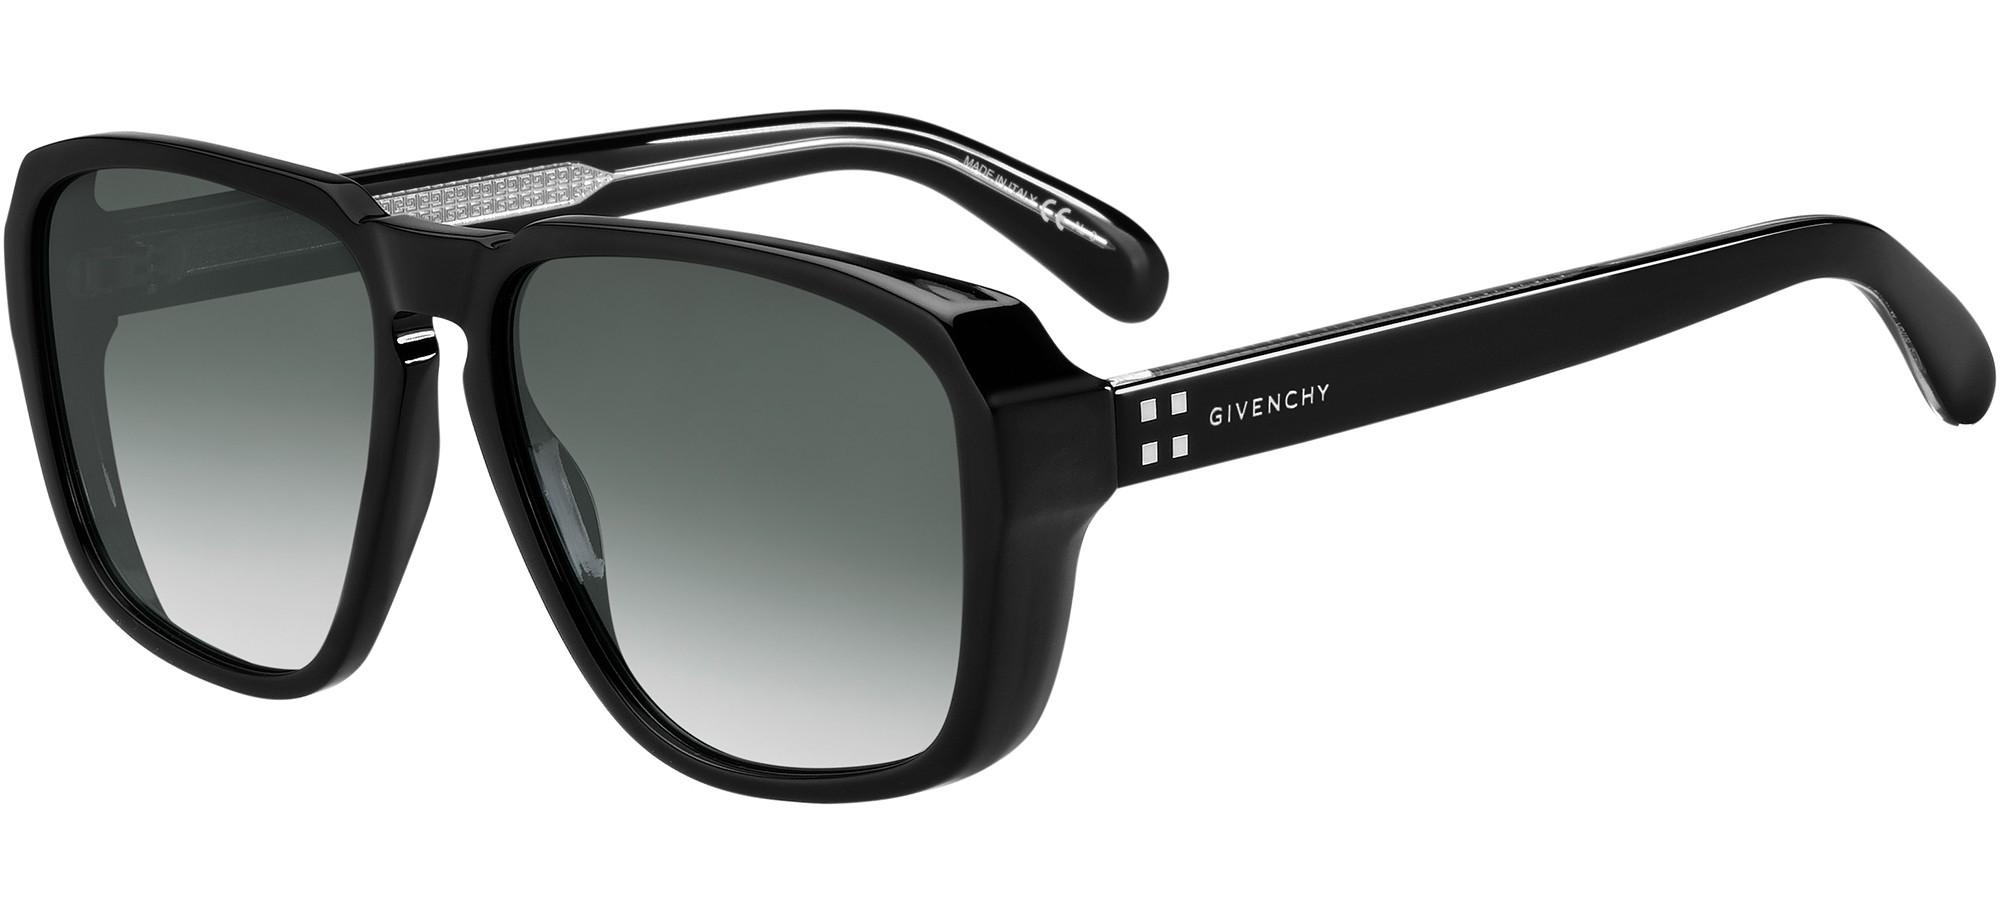 Givenchy 4G SQUARE GV 7121/S